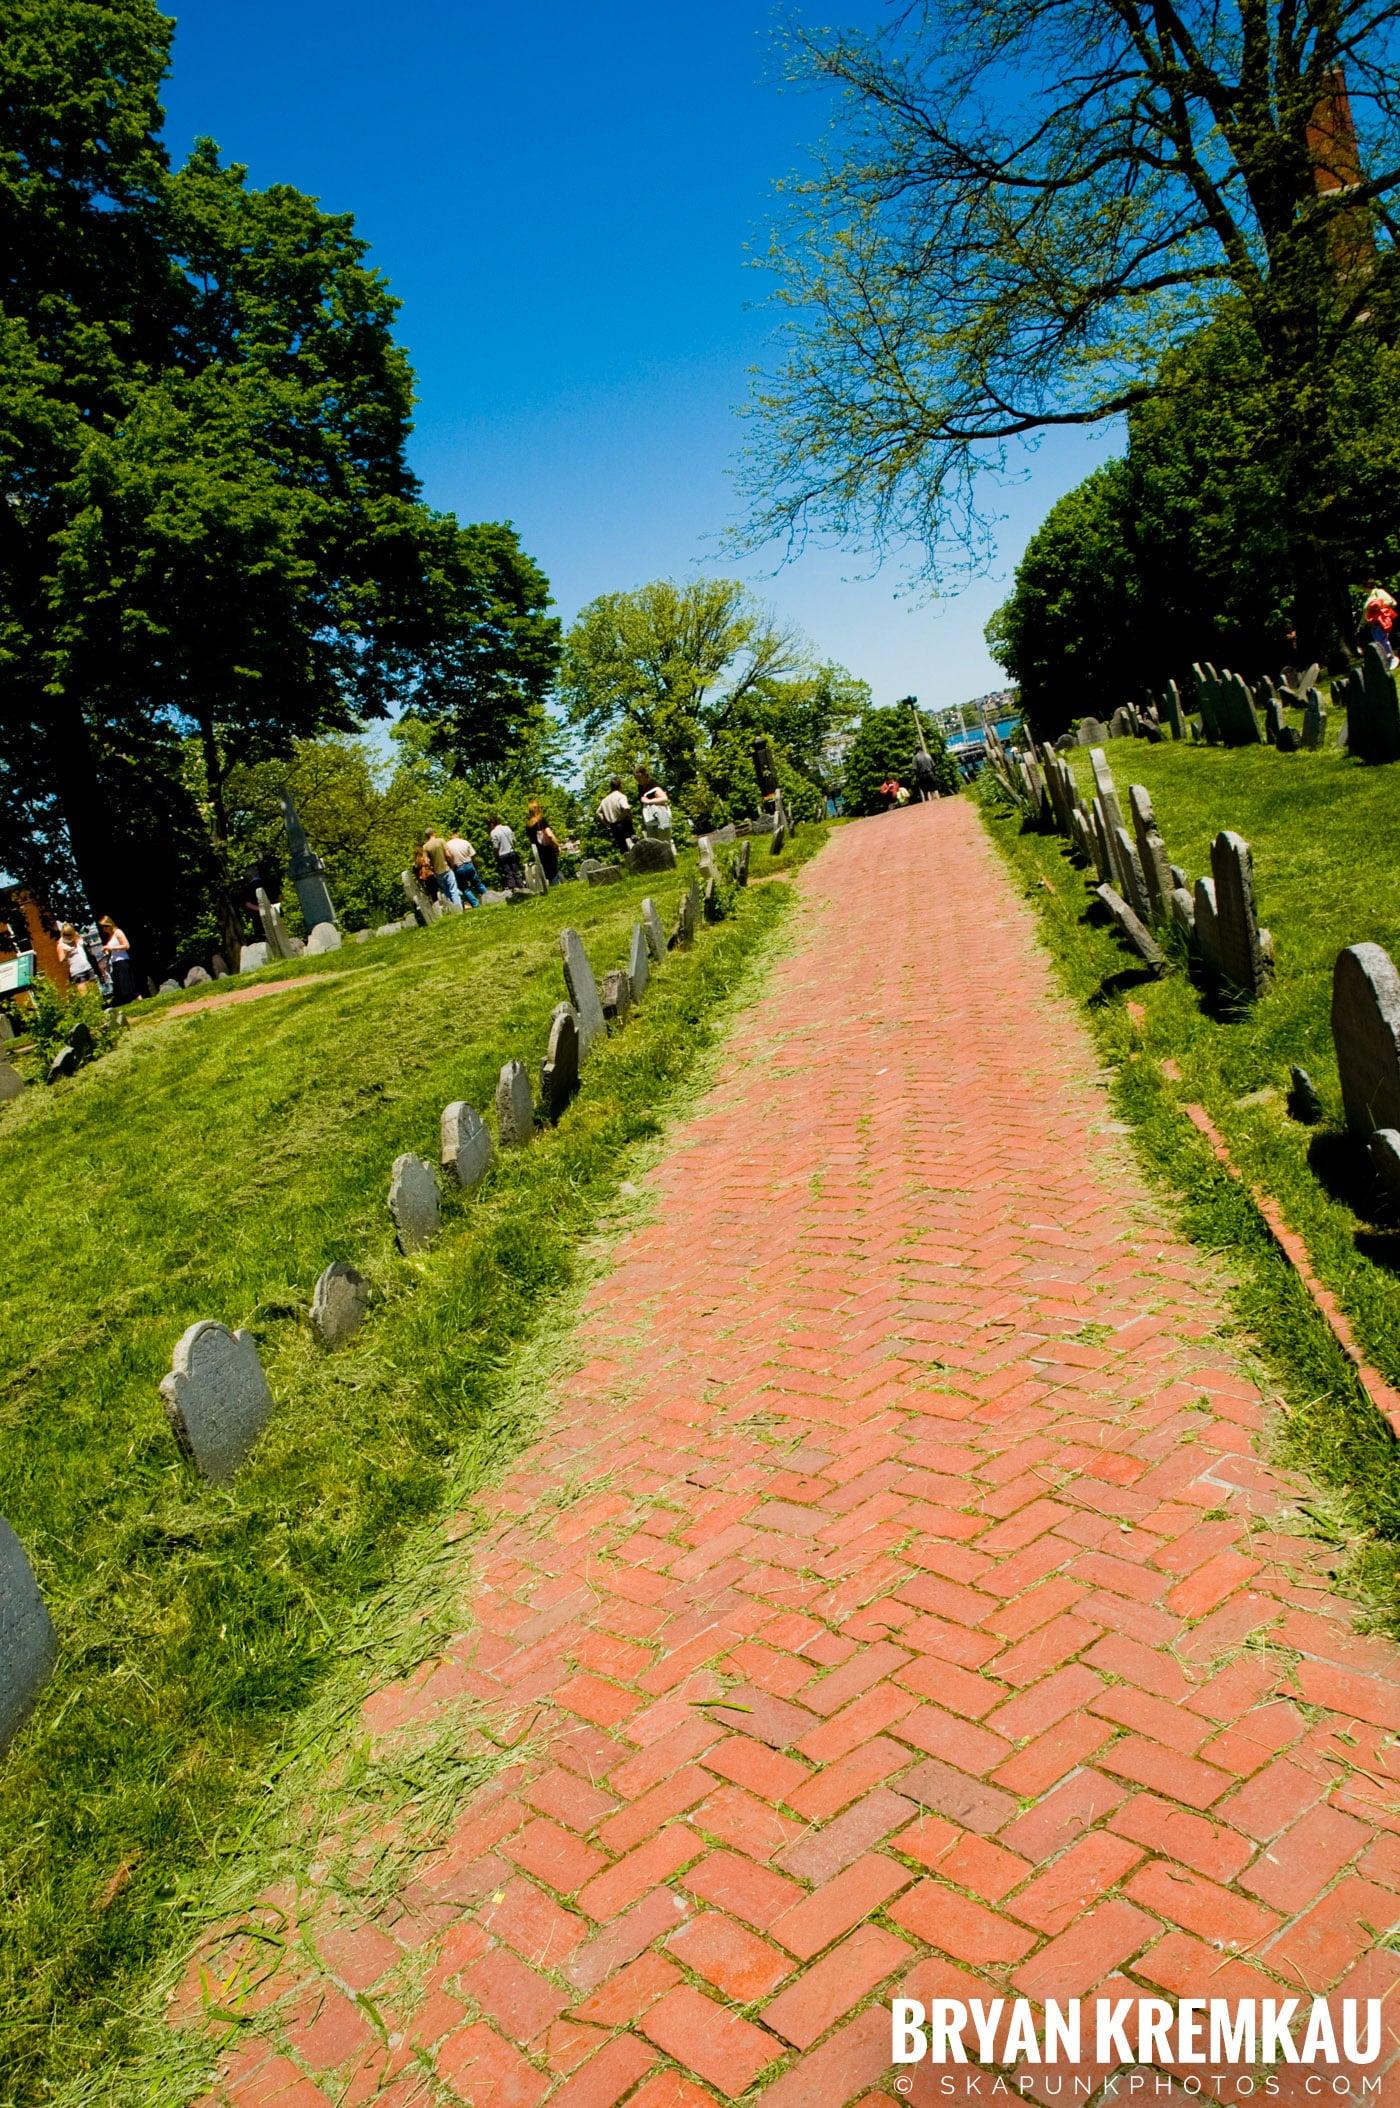 Memorial Day Weekend Trip to Boston - 5.25.08 (20)